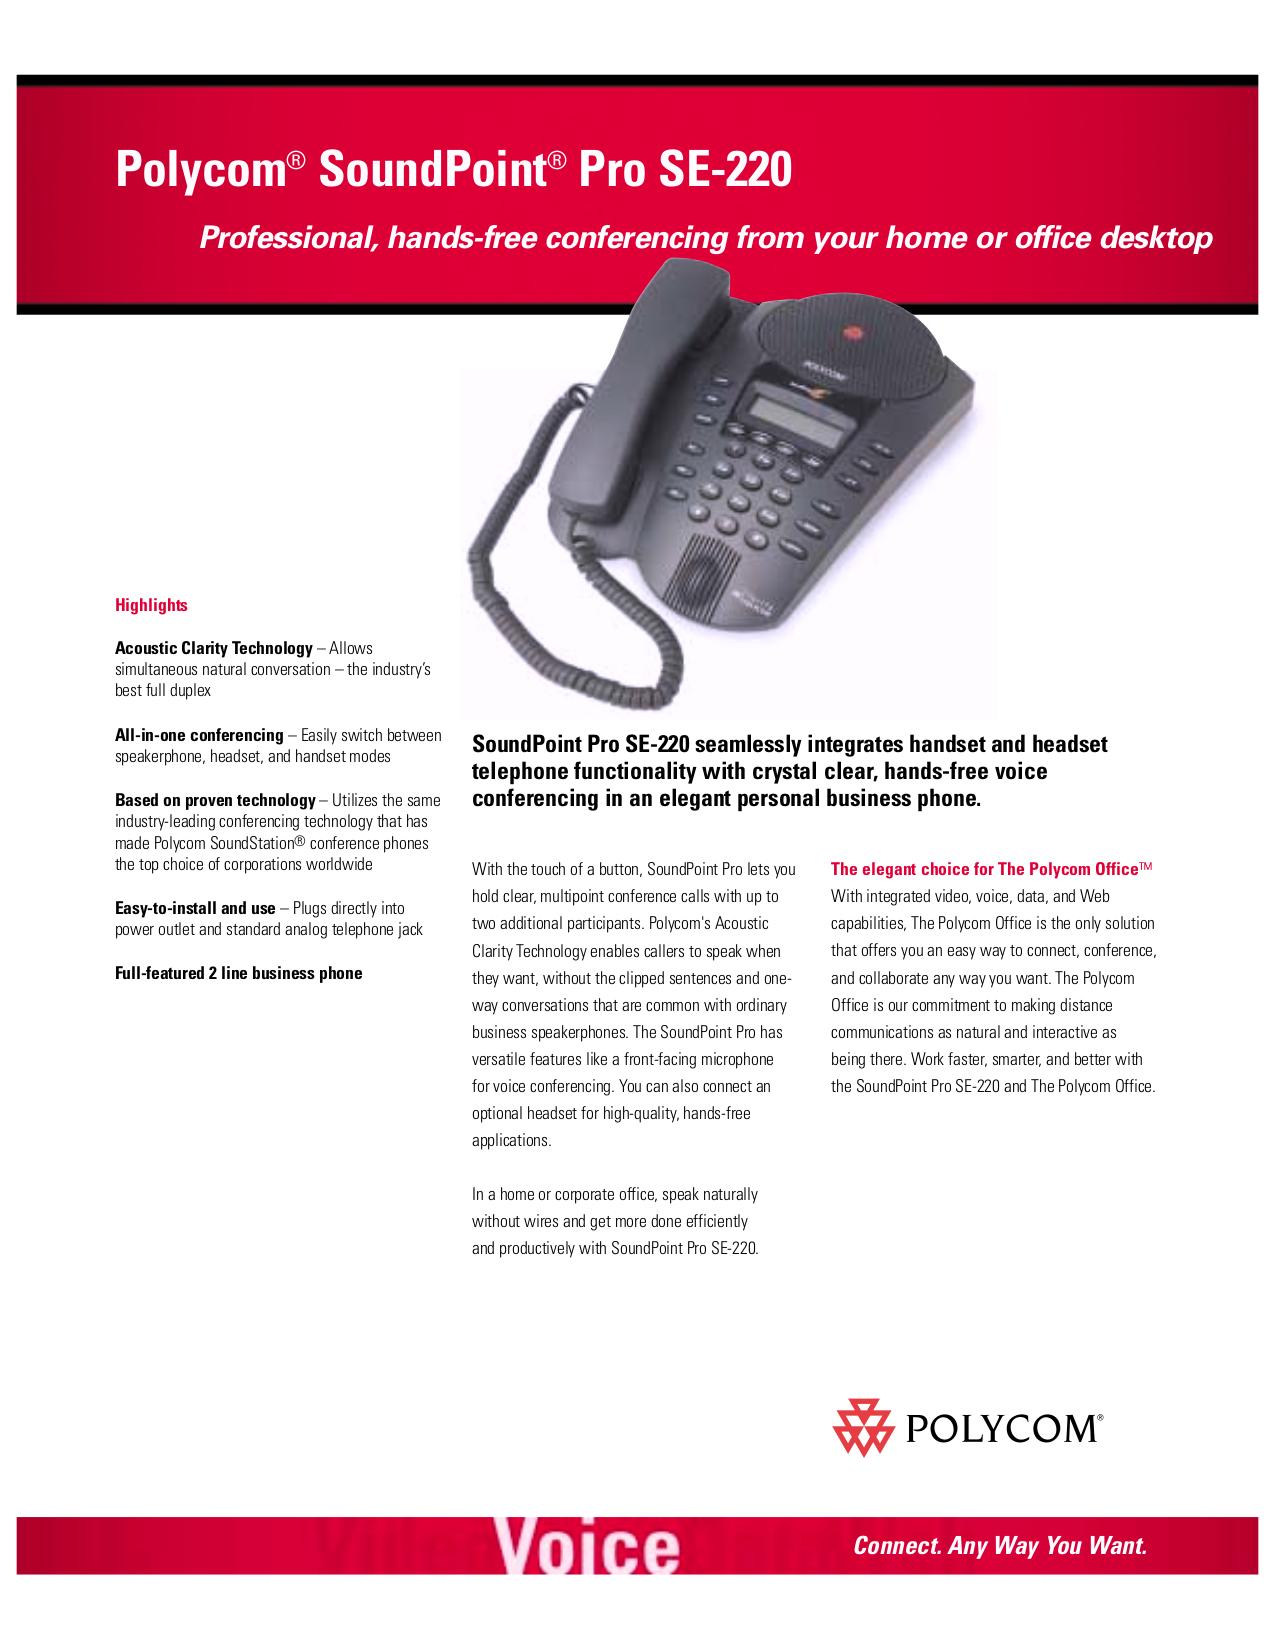 download free pdf for polycom soundpoint pro se 220 telephone manual rh umlib com polycom soundpoint pro se-225 manual polycom soundpoint pro se-225 corded phone manual